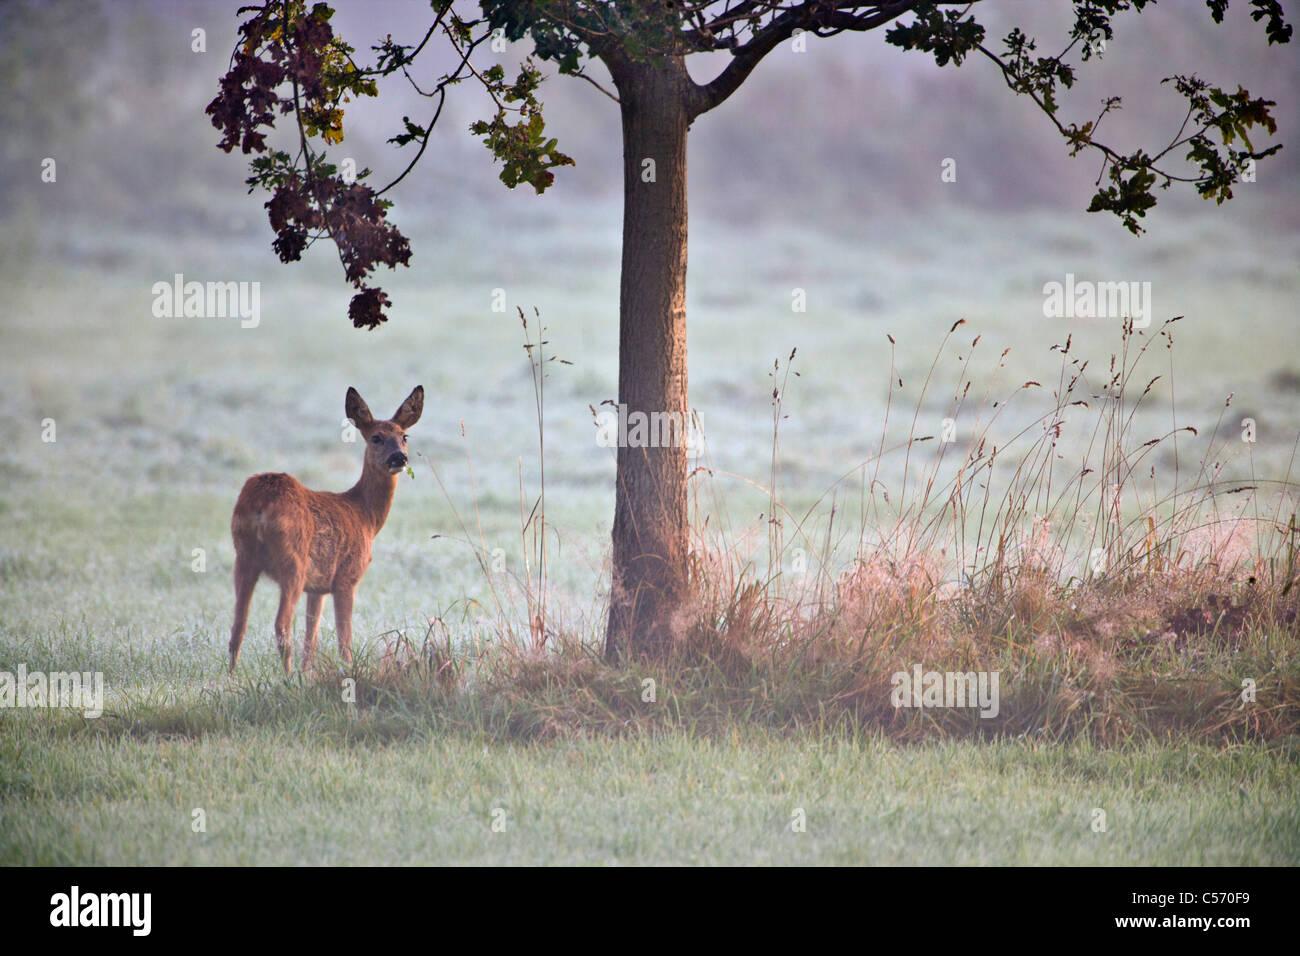 I Paesi Bassi, 's-Graveland, cervo e capriolo. Immagini Stock